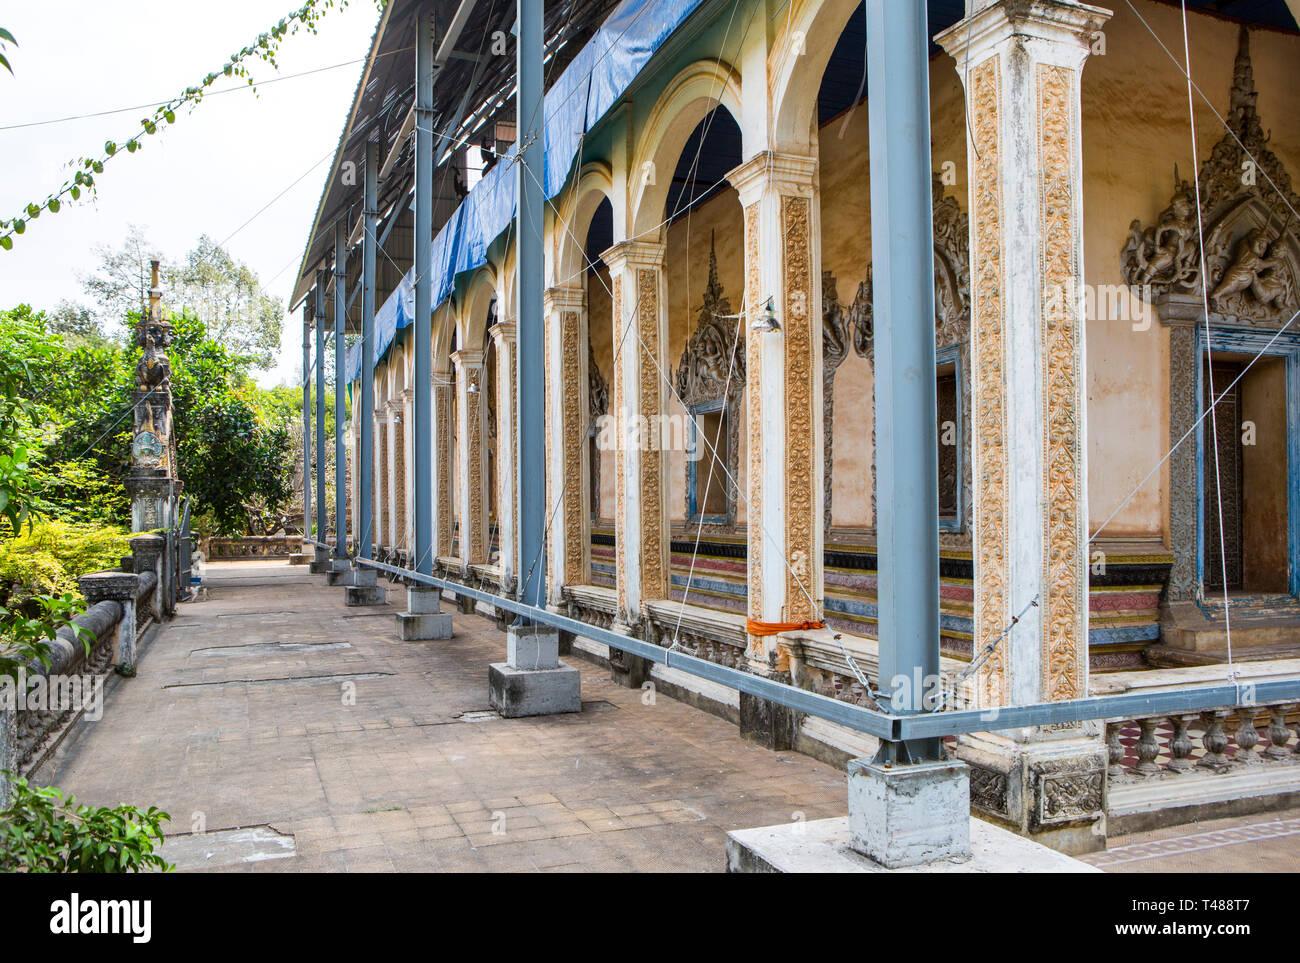 Rep[airs at Wat Bo Temple, Siem Reap, Cambodia. - Stock Image